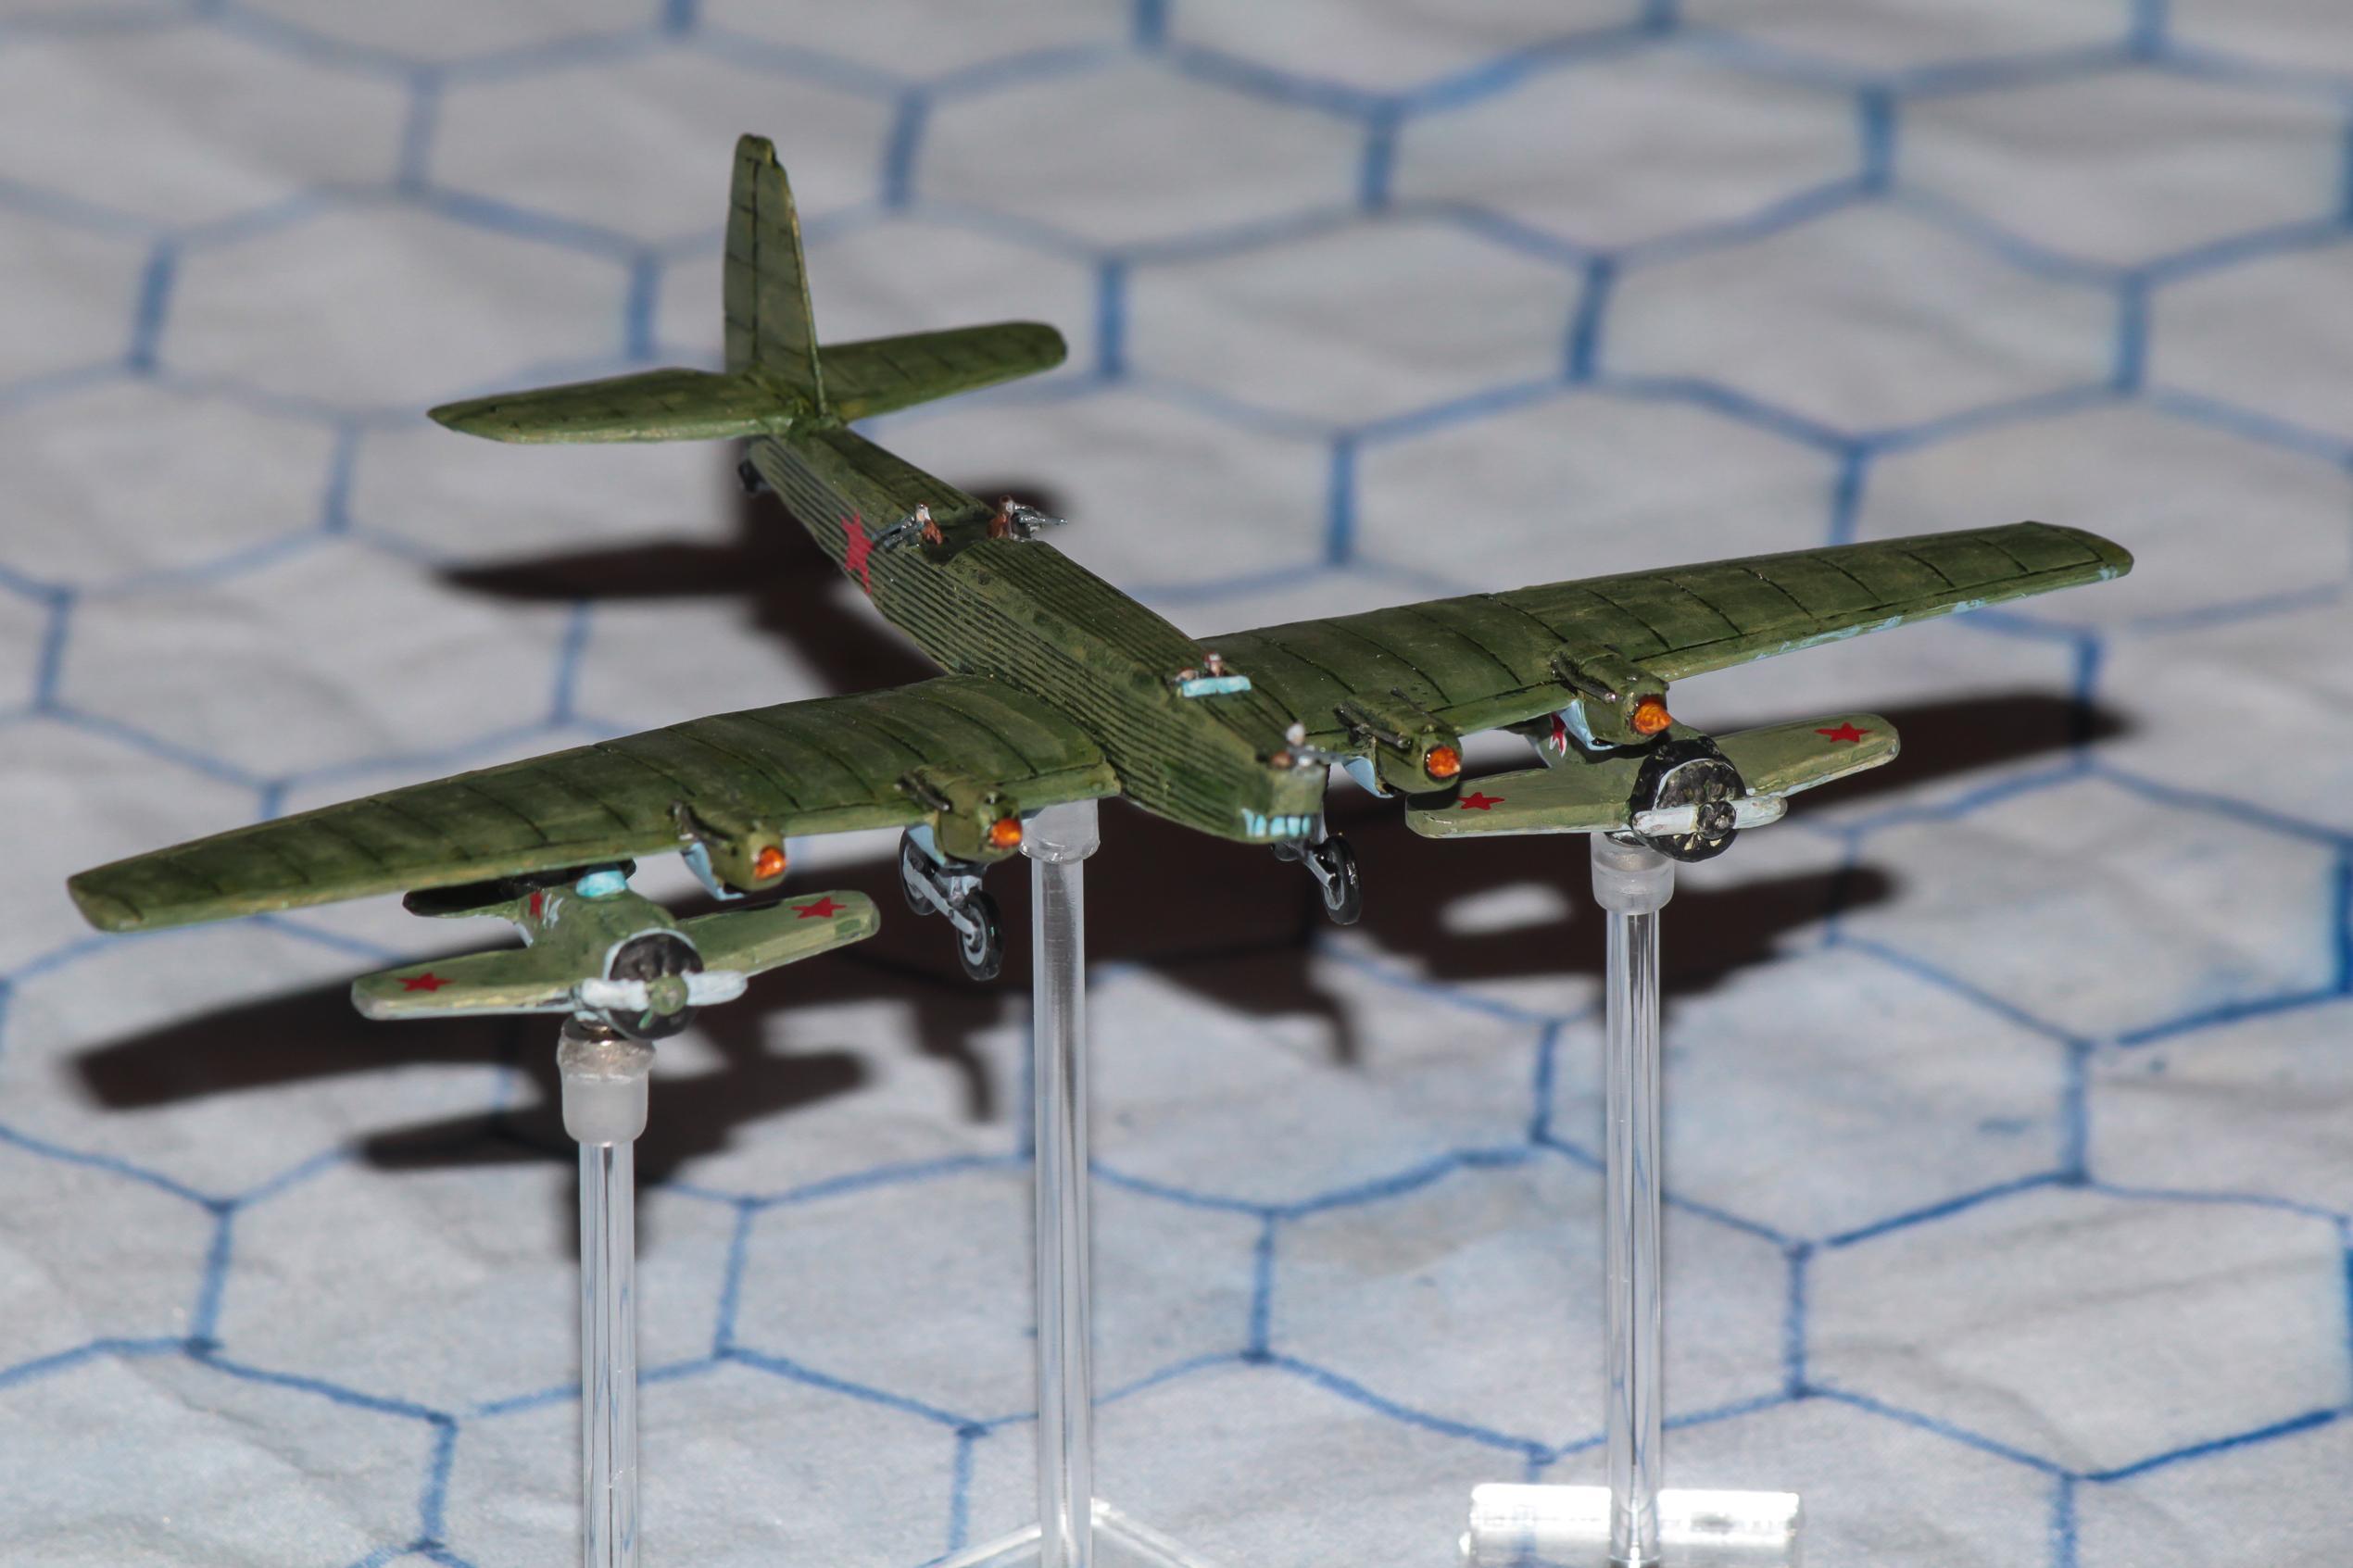 1:300 Scale, 6mm, Air Combat, Aircraft, Aviation, Fliers, Historic, Soviet, Ussr, World War 2